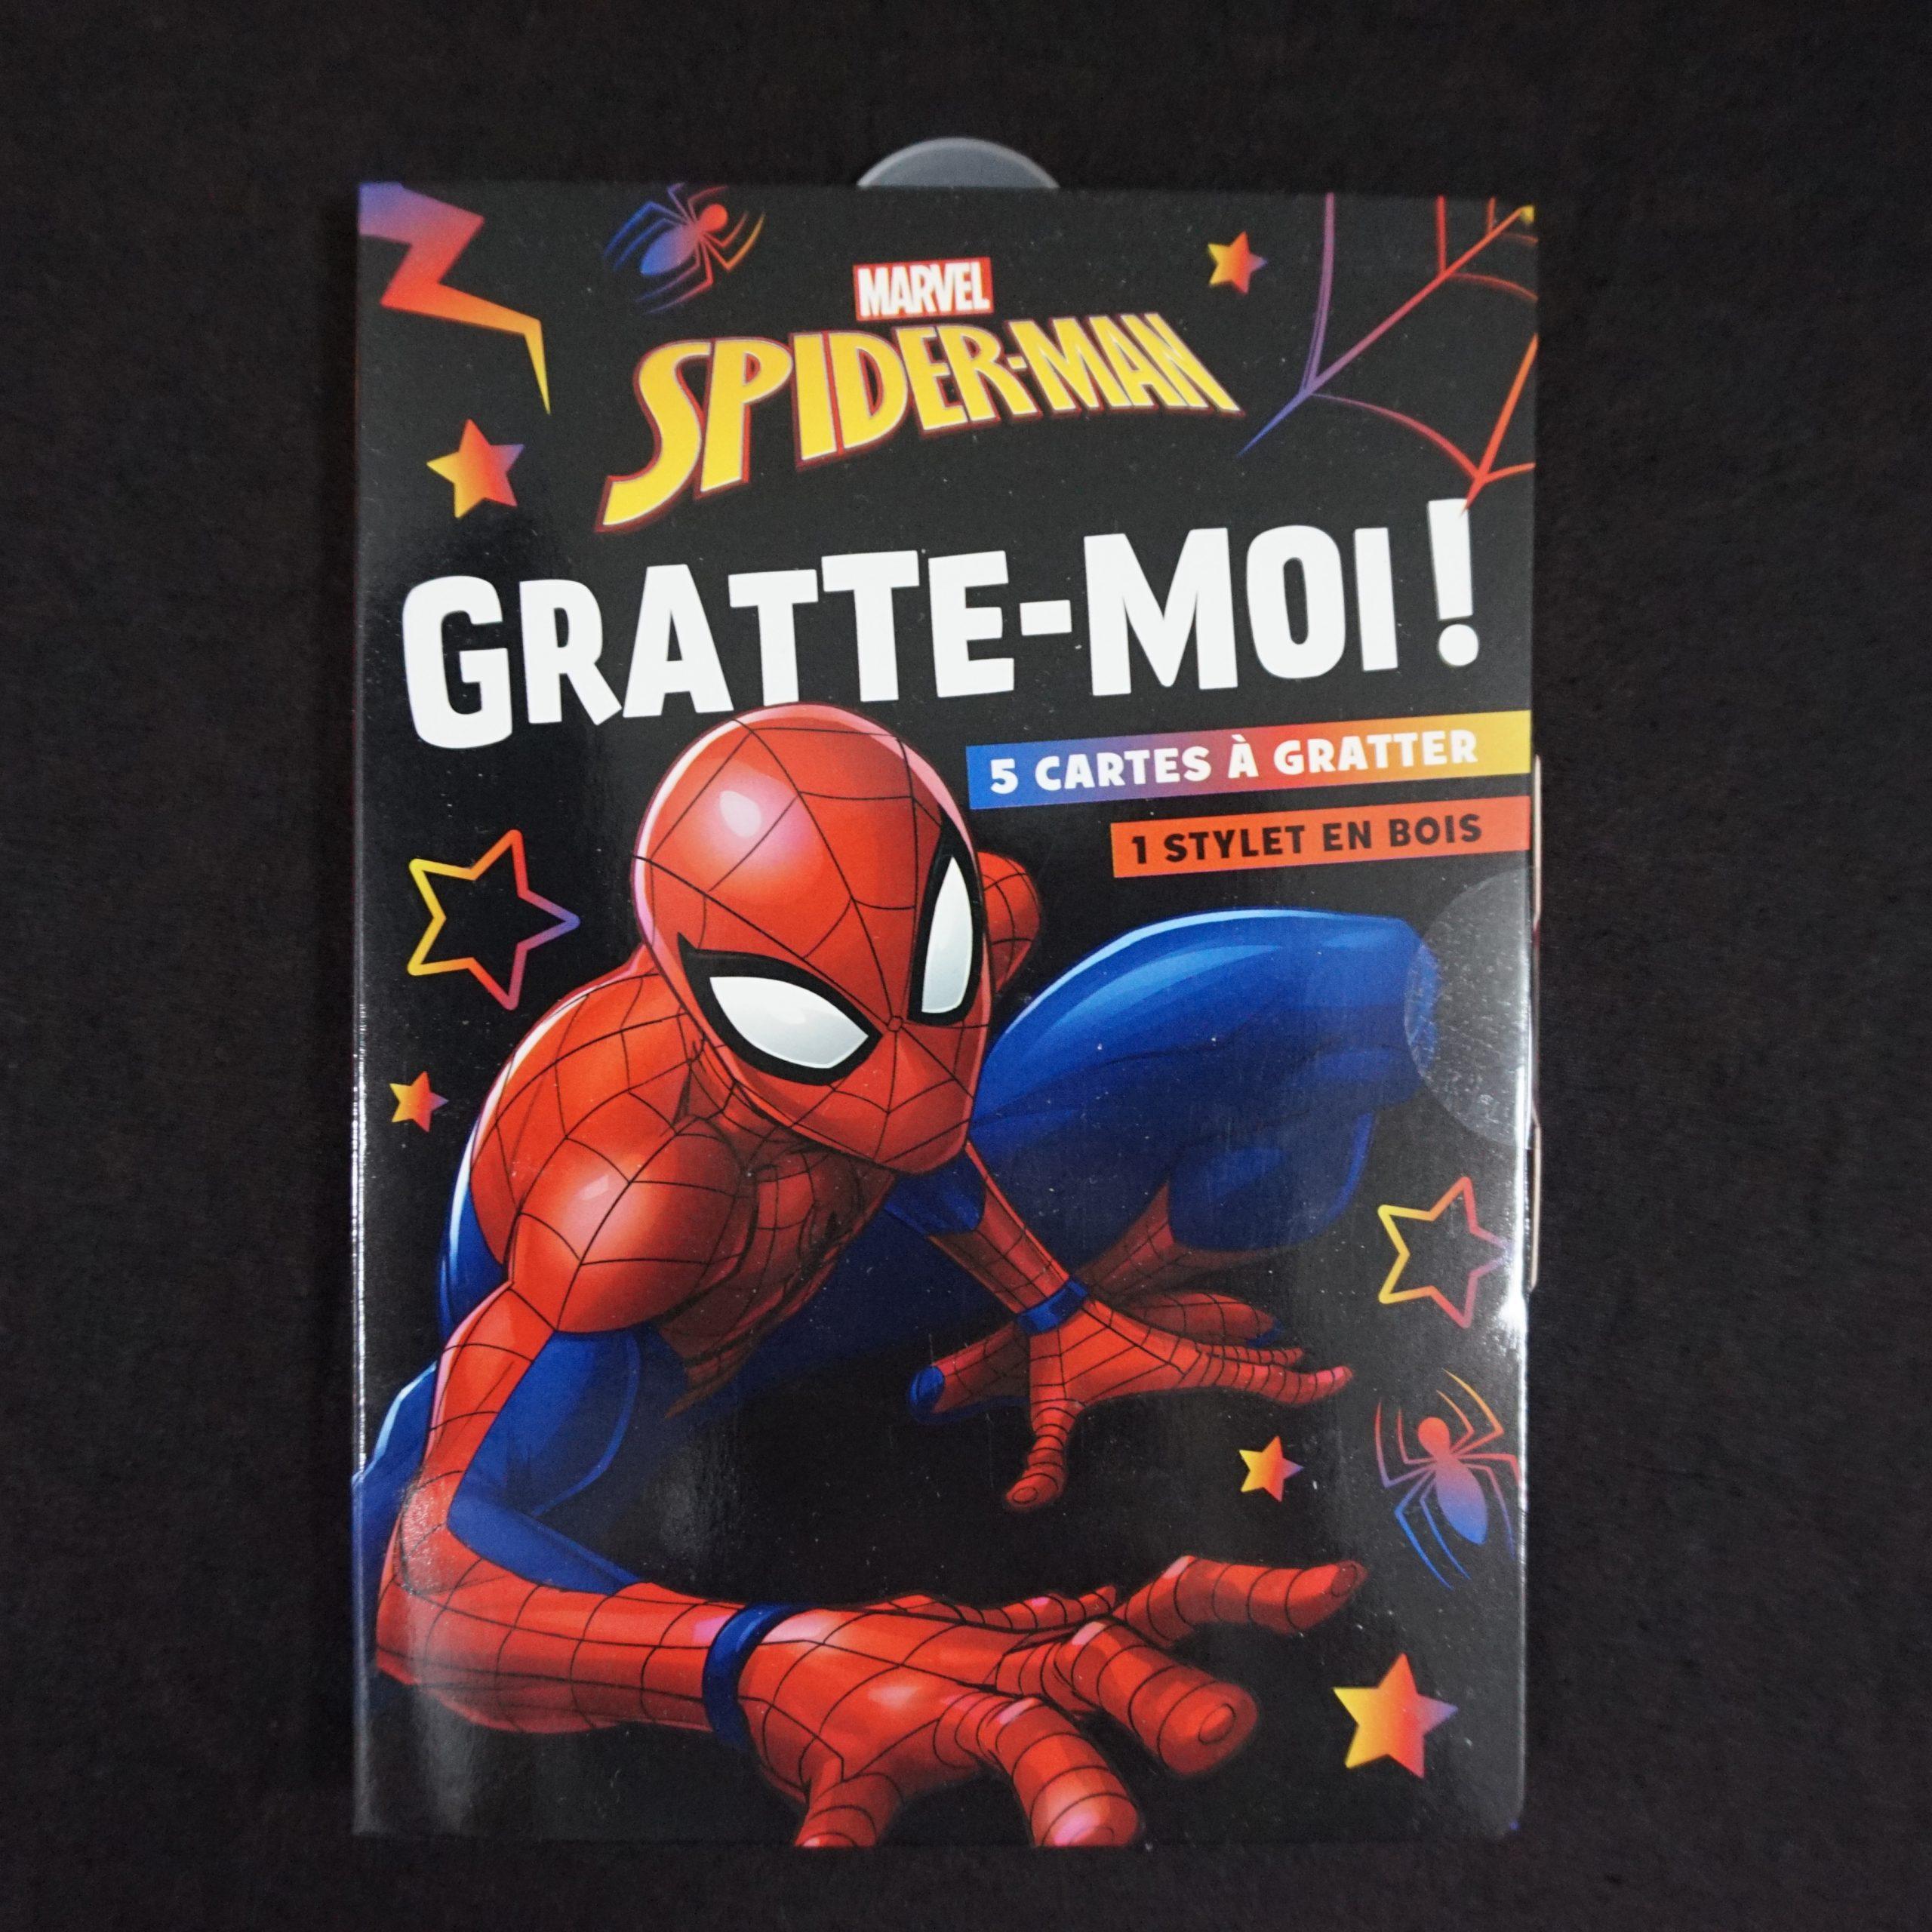 Spider-man - Mini pochette - Gratte-moi ! - Marvel